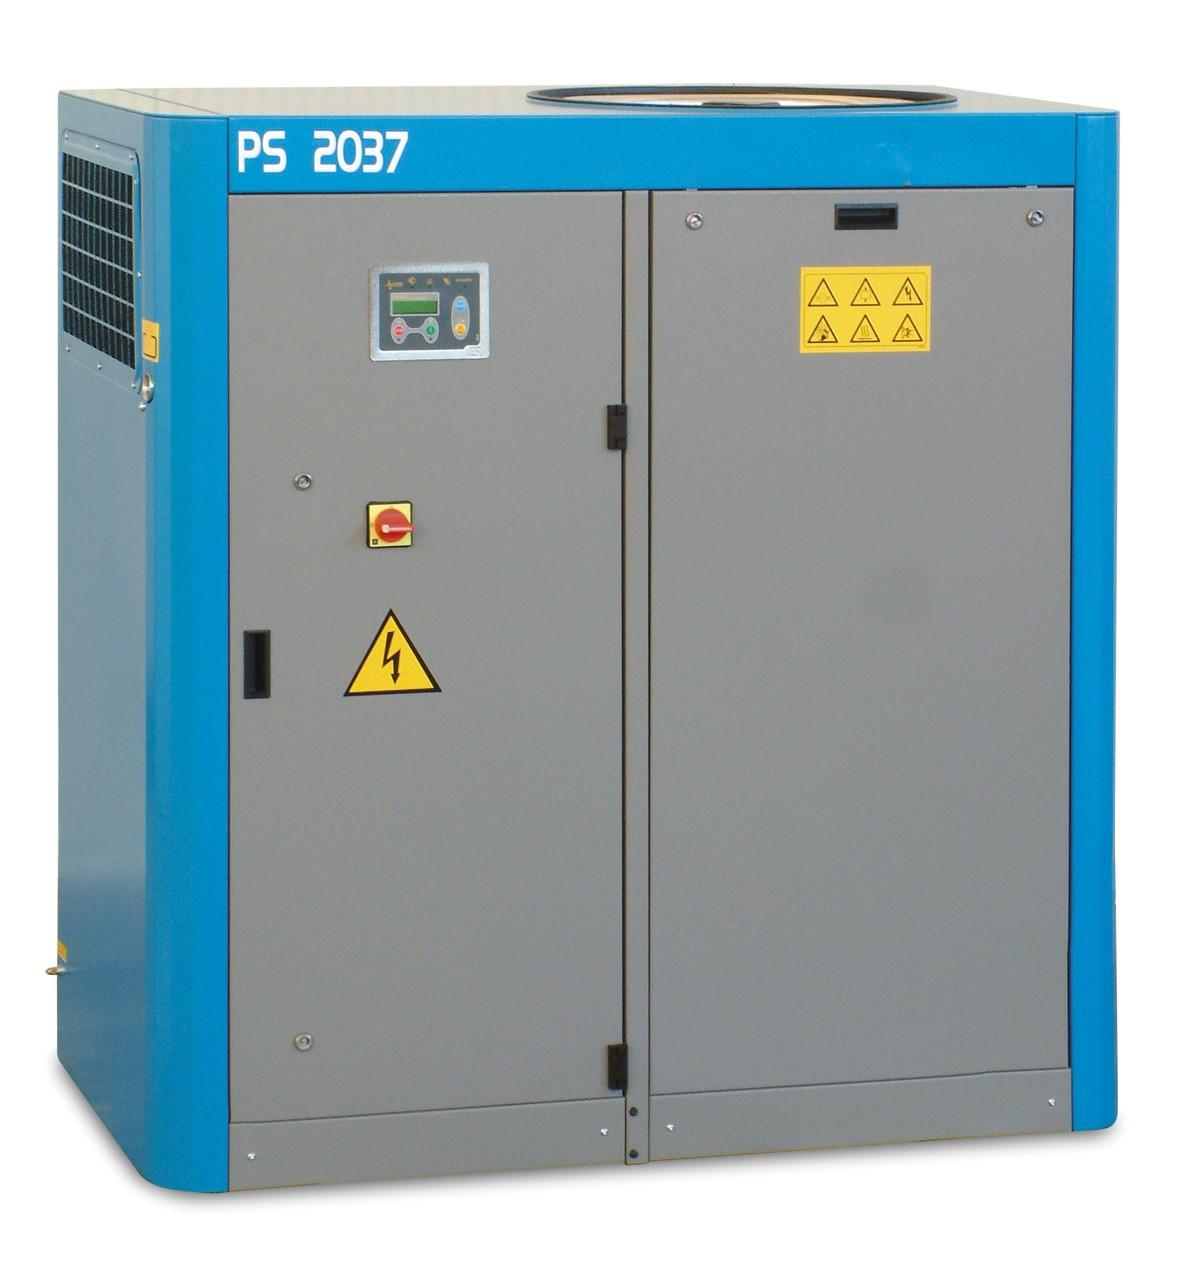 Šroubové kompresory série PS 2000 a PS 3100